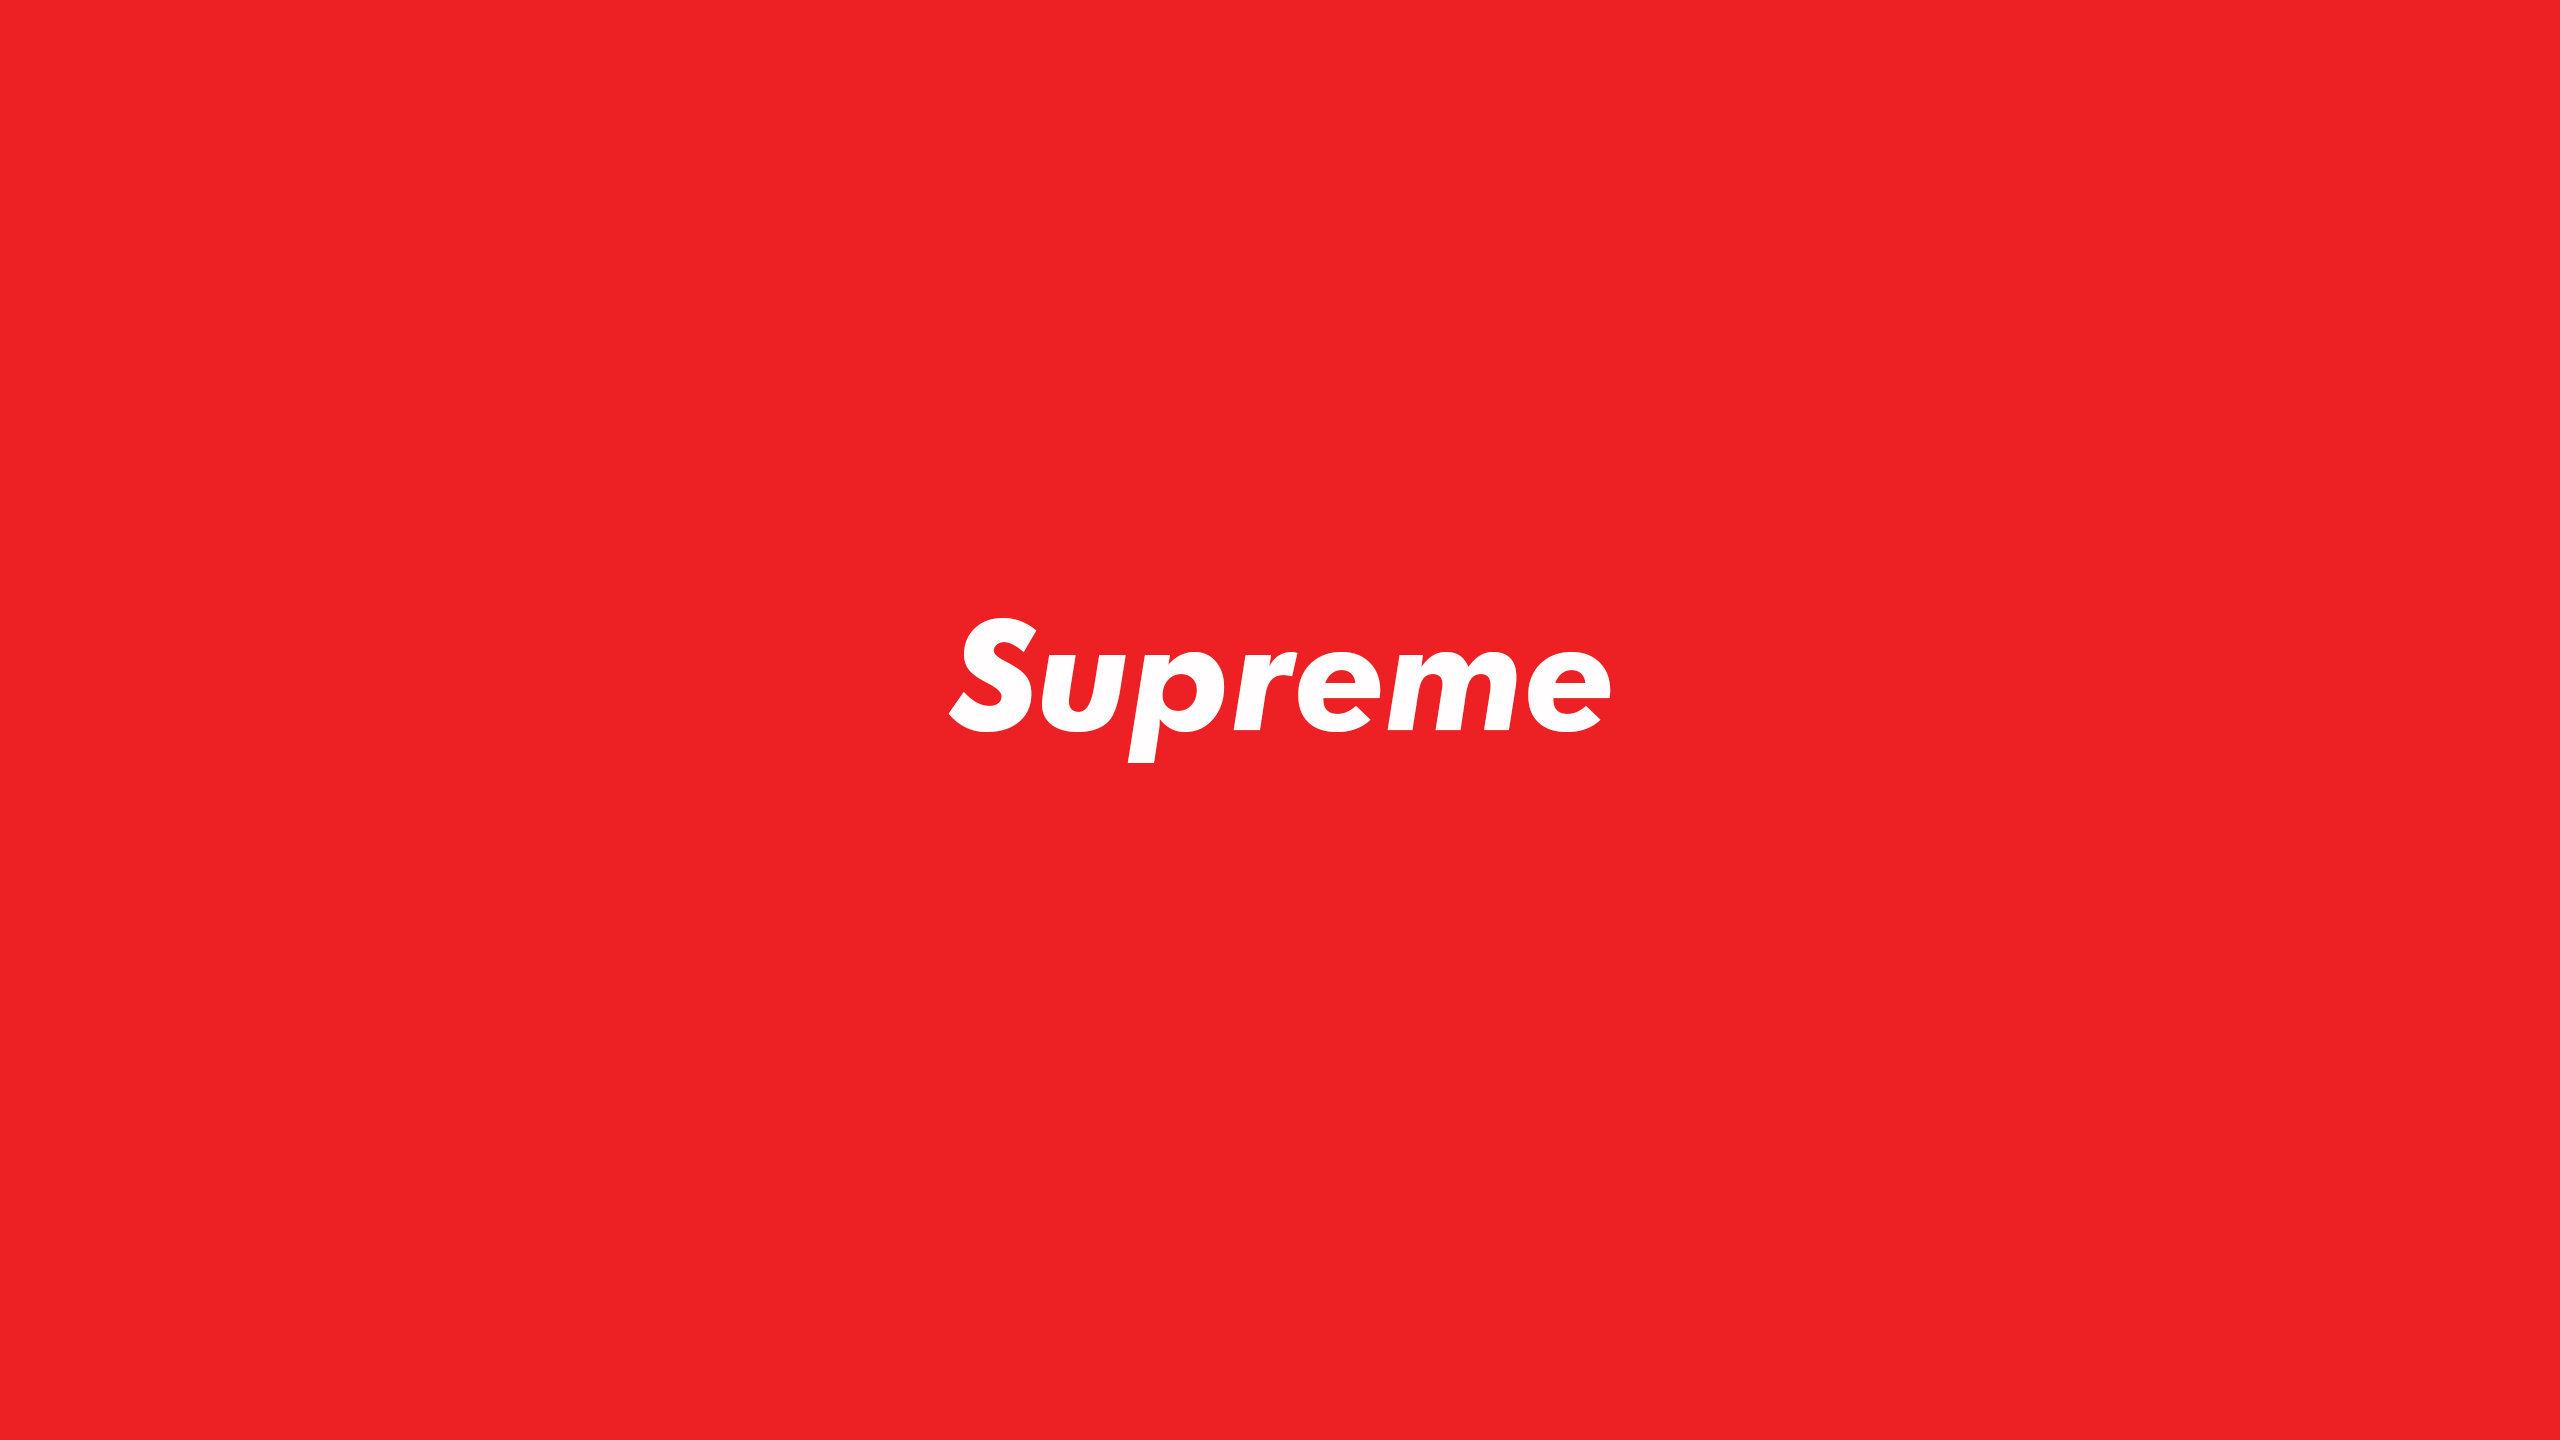 Supreme Wallpaper - » - Supreme , HD Wallpaper & Backgrounds